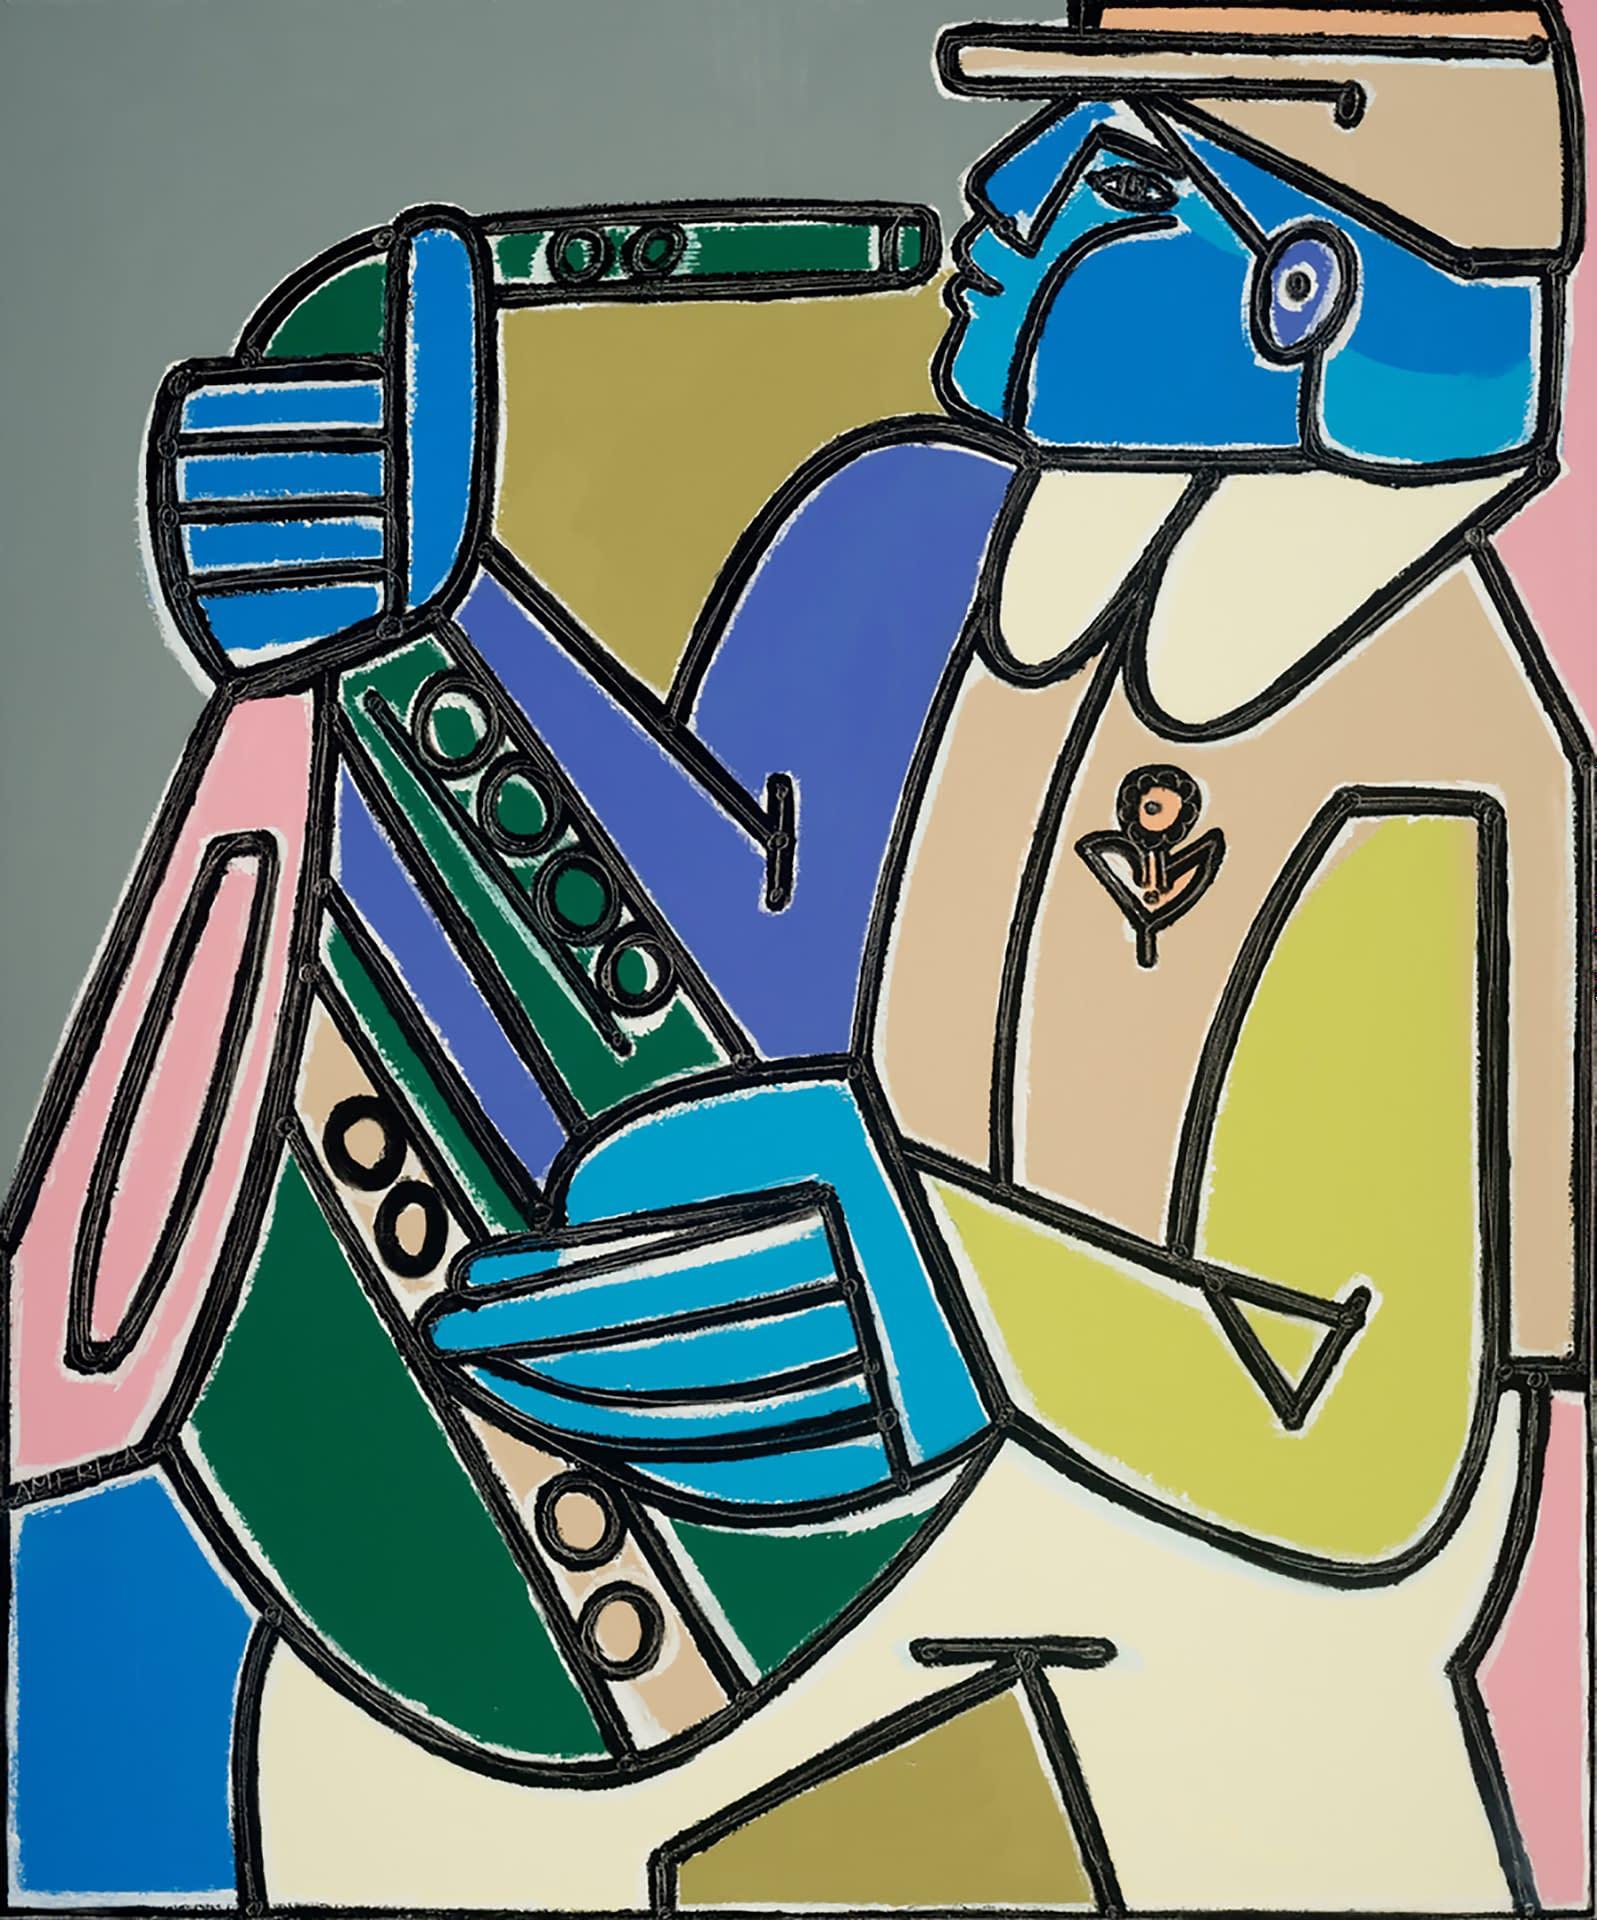 Baritone_Man_America_Martin_Oil__Acrylic_on_Canvas_48x40